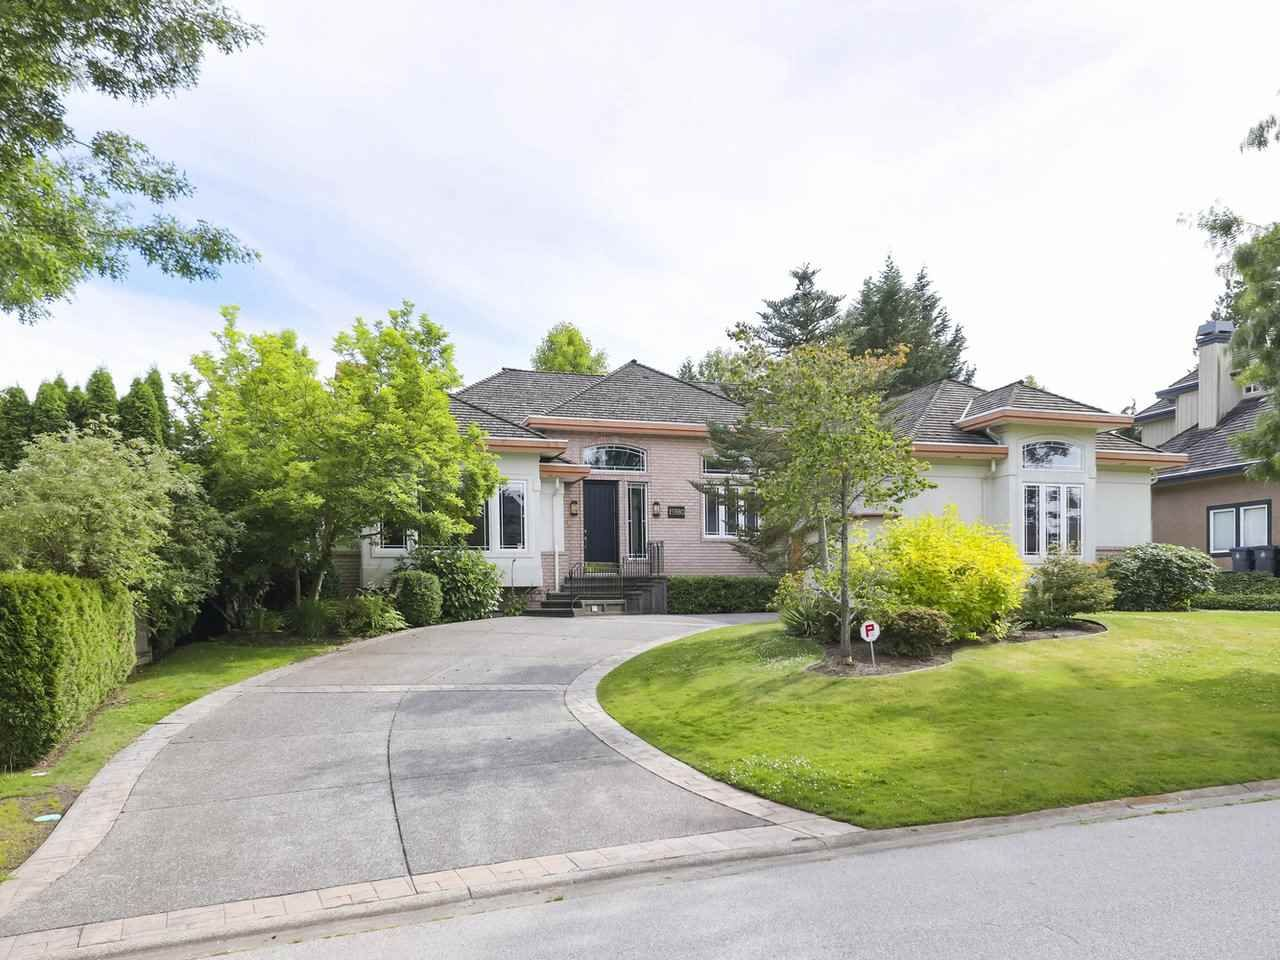 "Main Photo: 15980 HUMBERSIDE Avenue in Surrey: Morgan Creek House for sale in ""Morgan Creek"" (South Surrey White Rock)  : MLS®# R2474794"